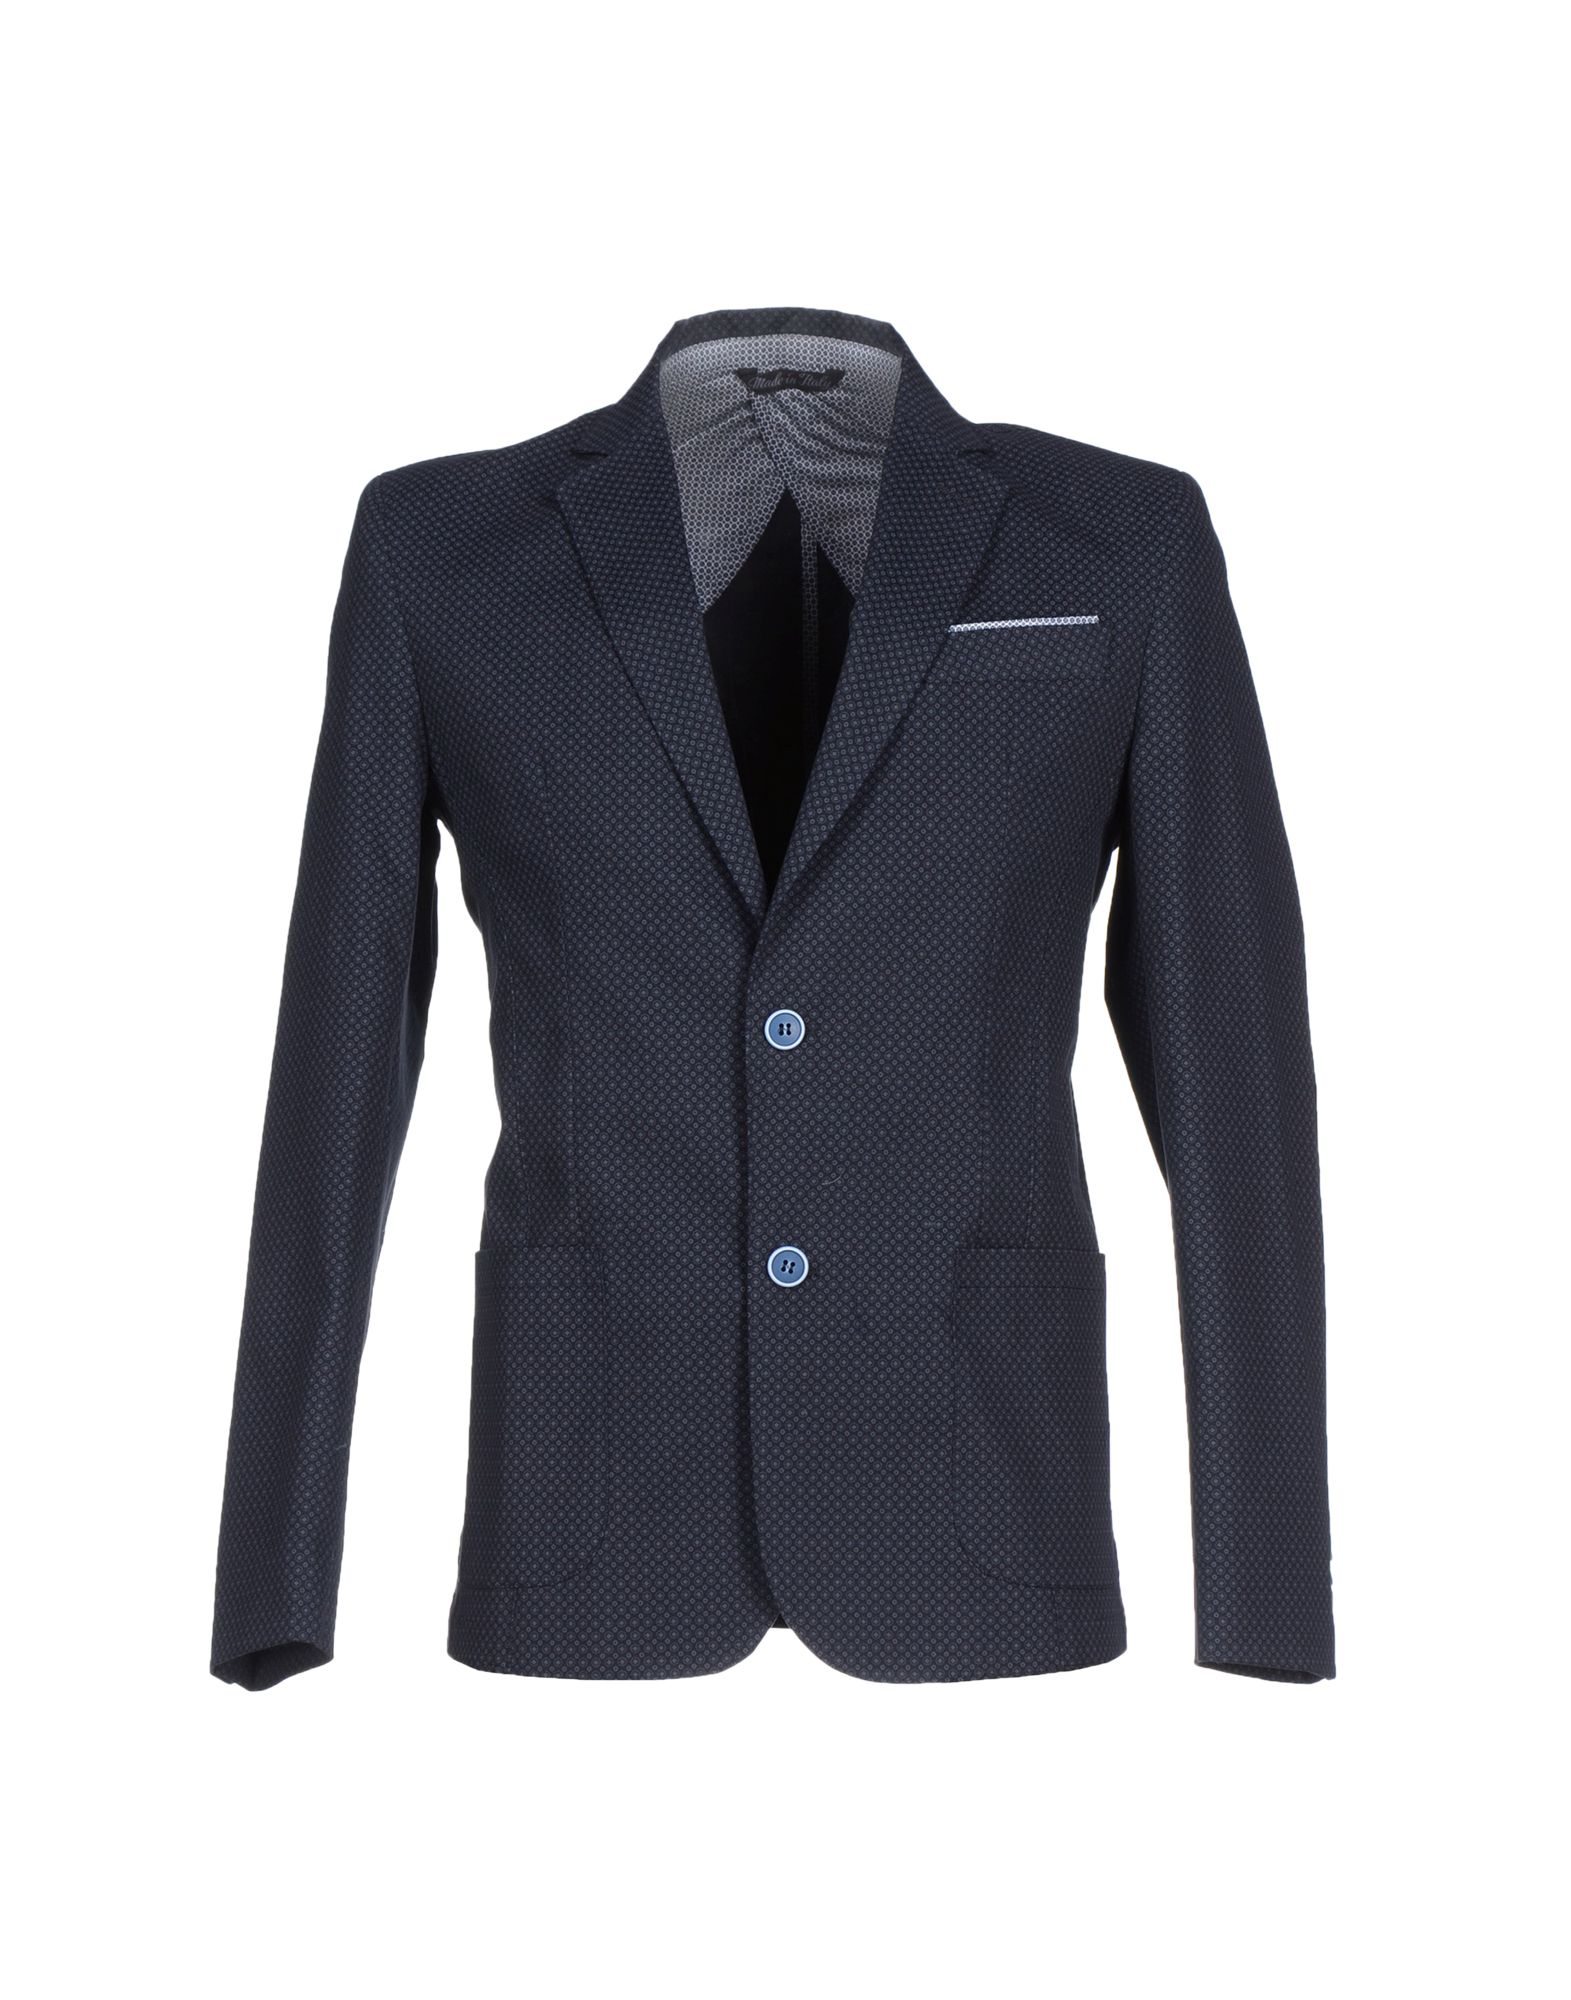 DAMA Blazers in Dark Blue